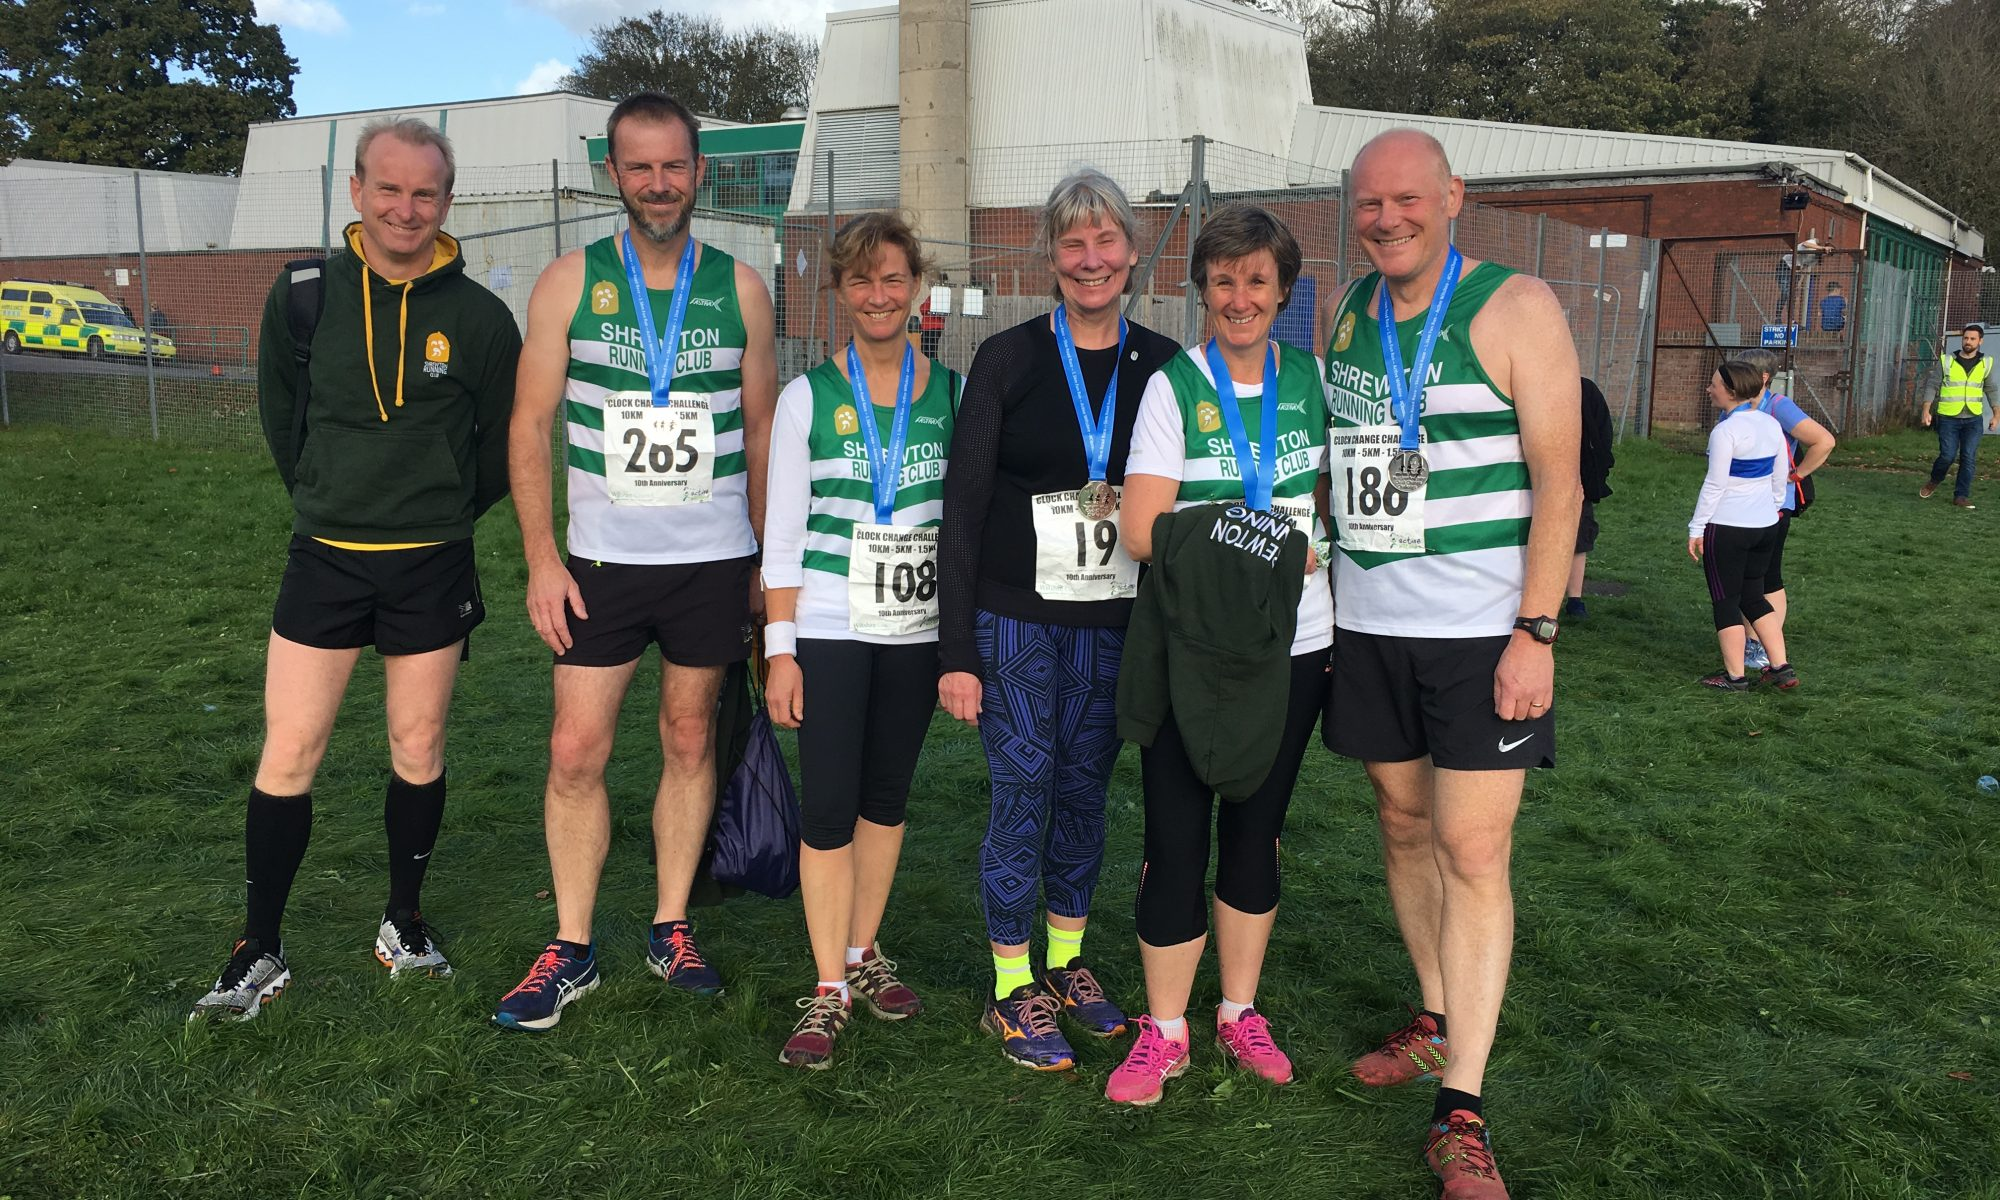 Shrewton runners